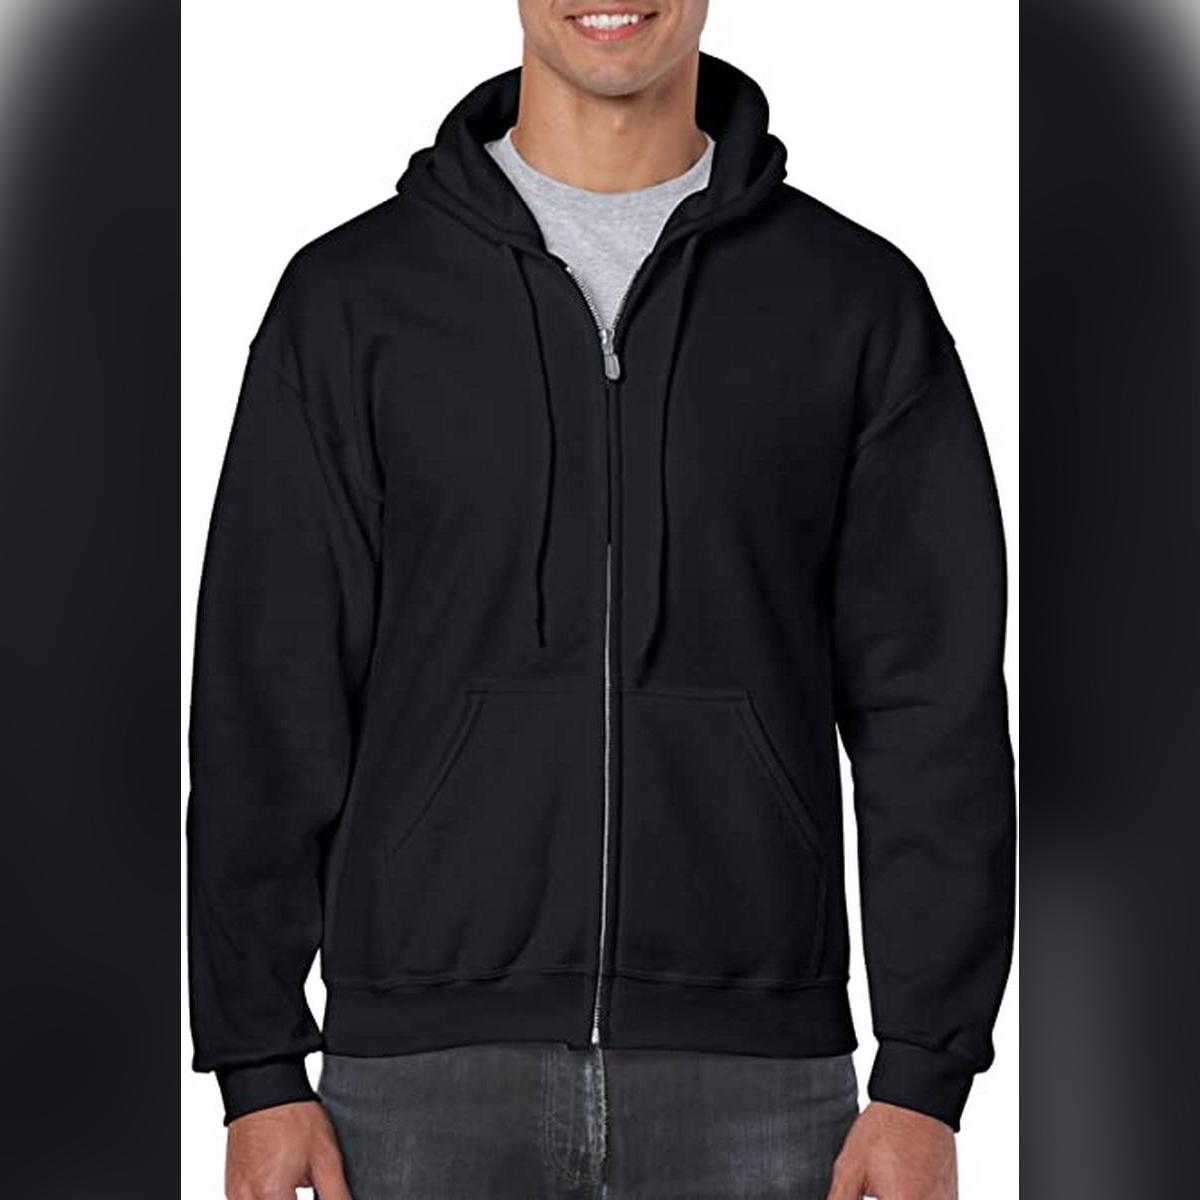 Black Plain Zipped Hooded Hoodie For Men and Womens Zipper XXL Size